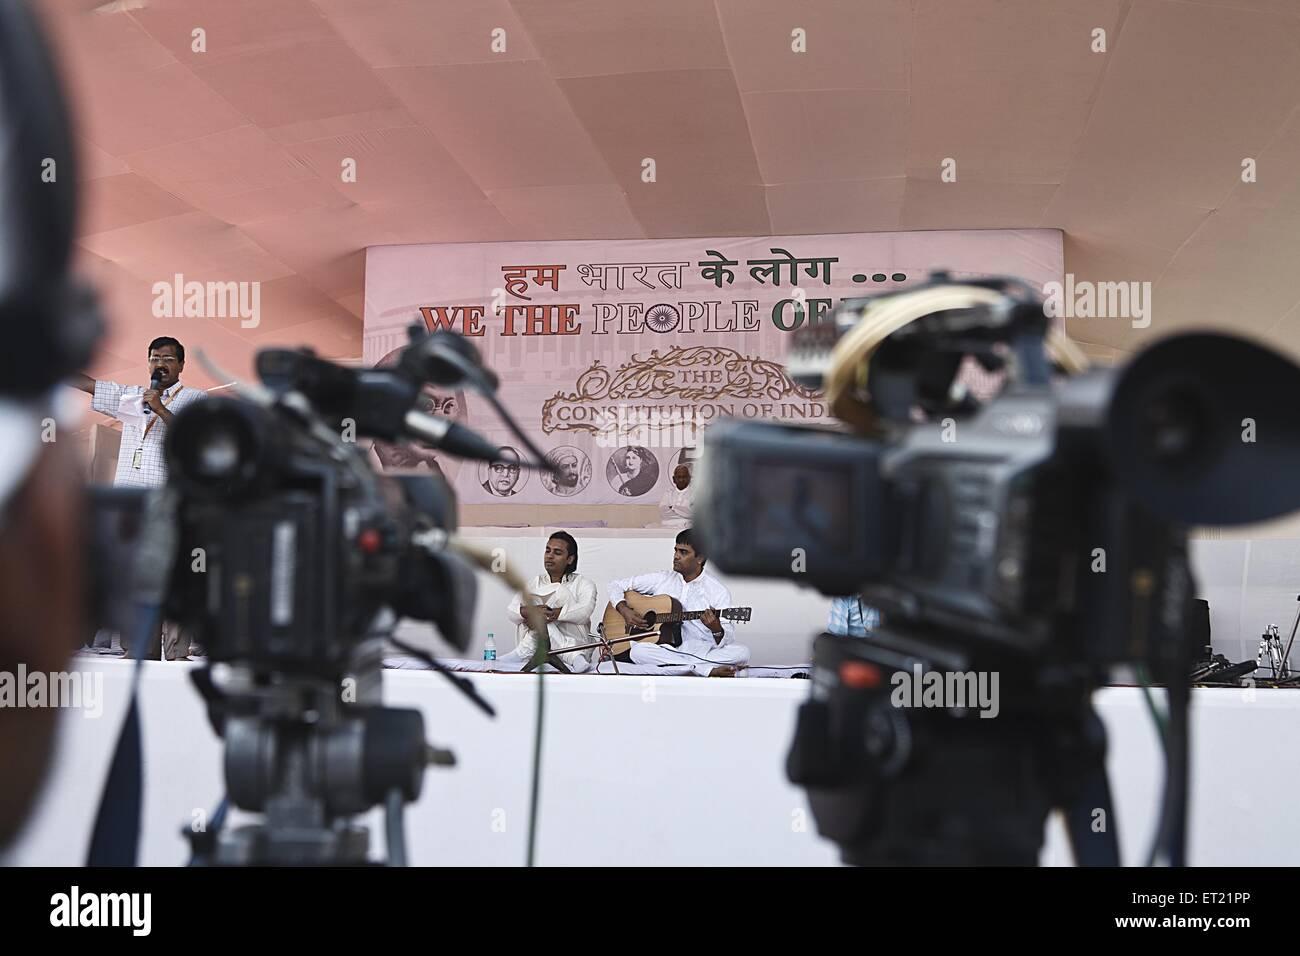 Video Camera Coverage Arvind Kejriwal Speech Mumbai Maharashtra India Asia Dec 2011 - Stock Image